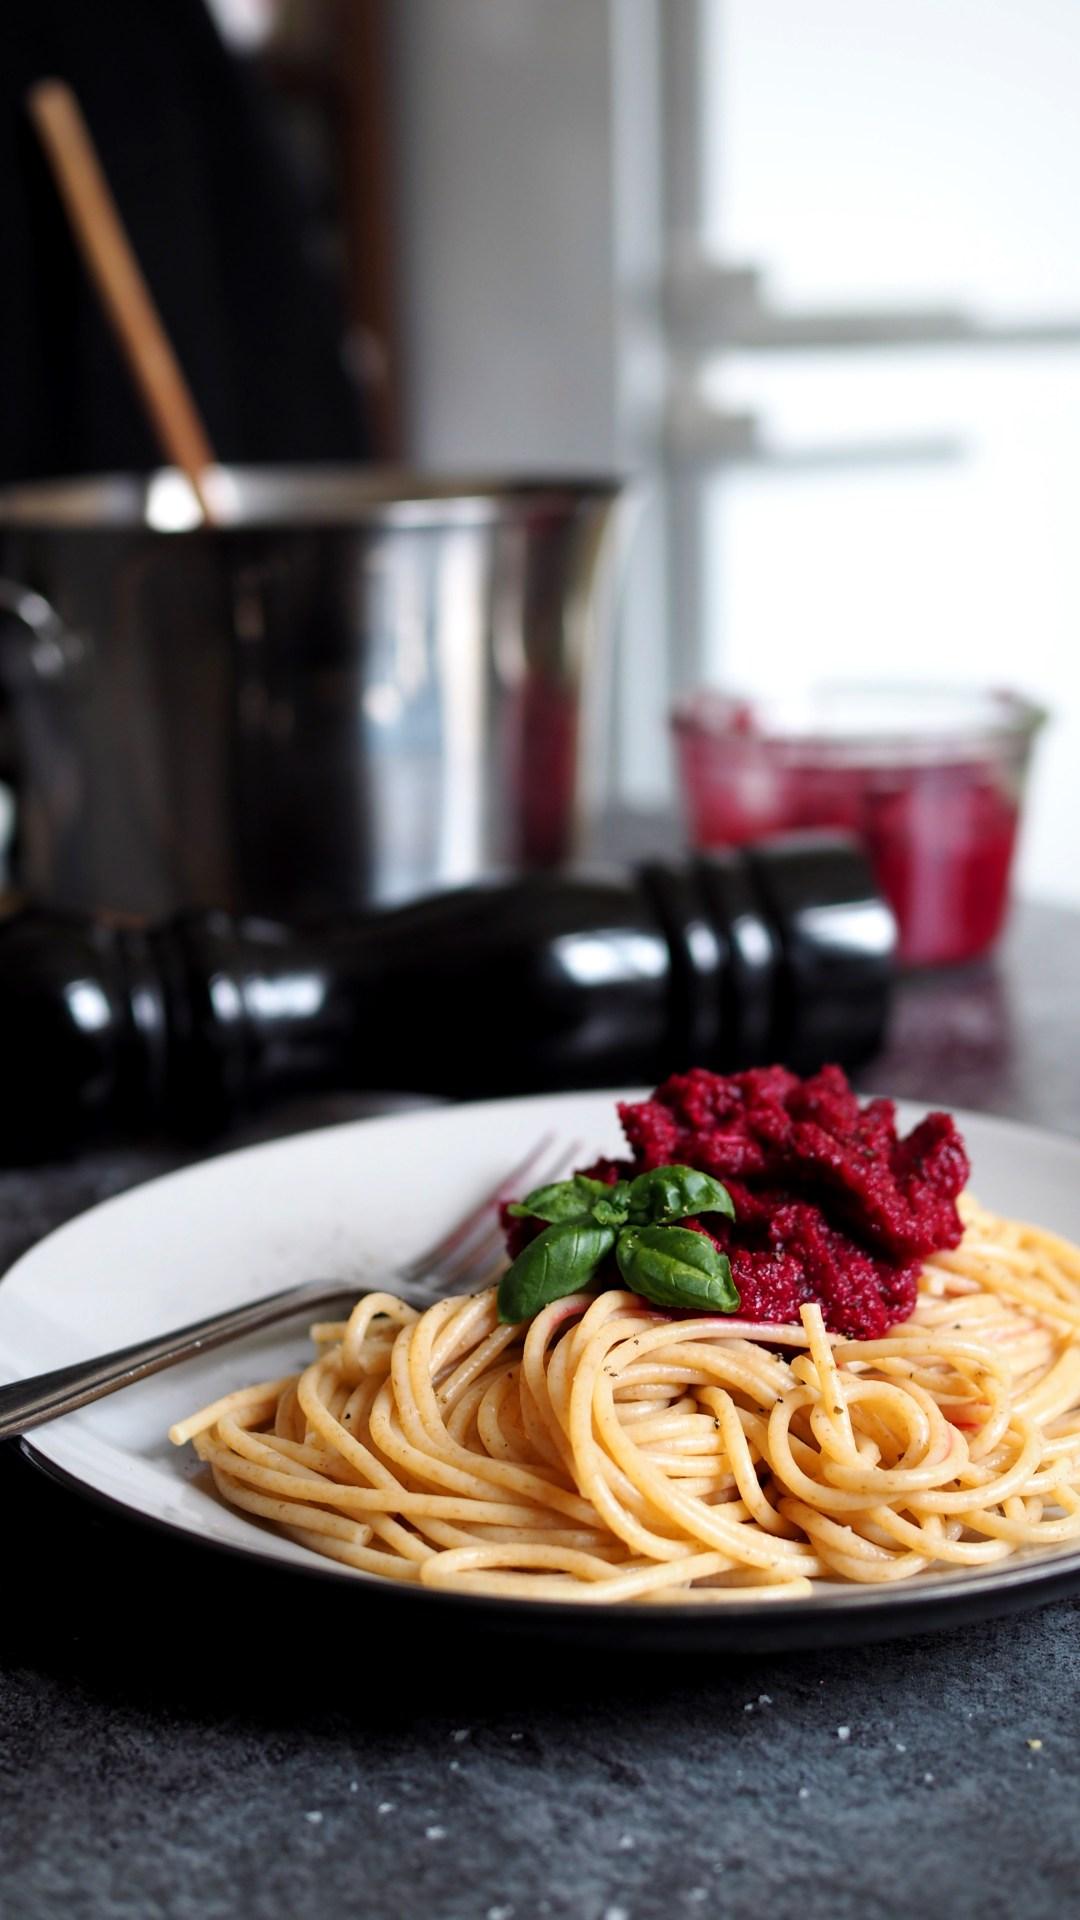 Rote Beete Pesto vegan